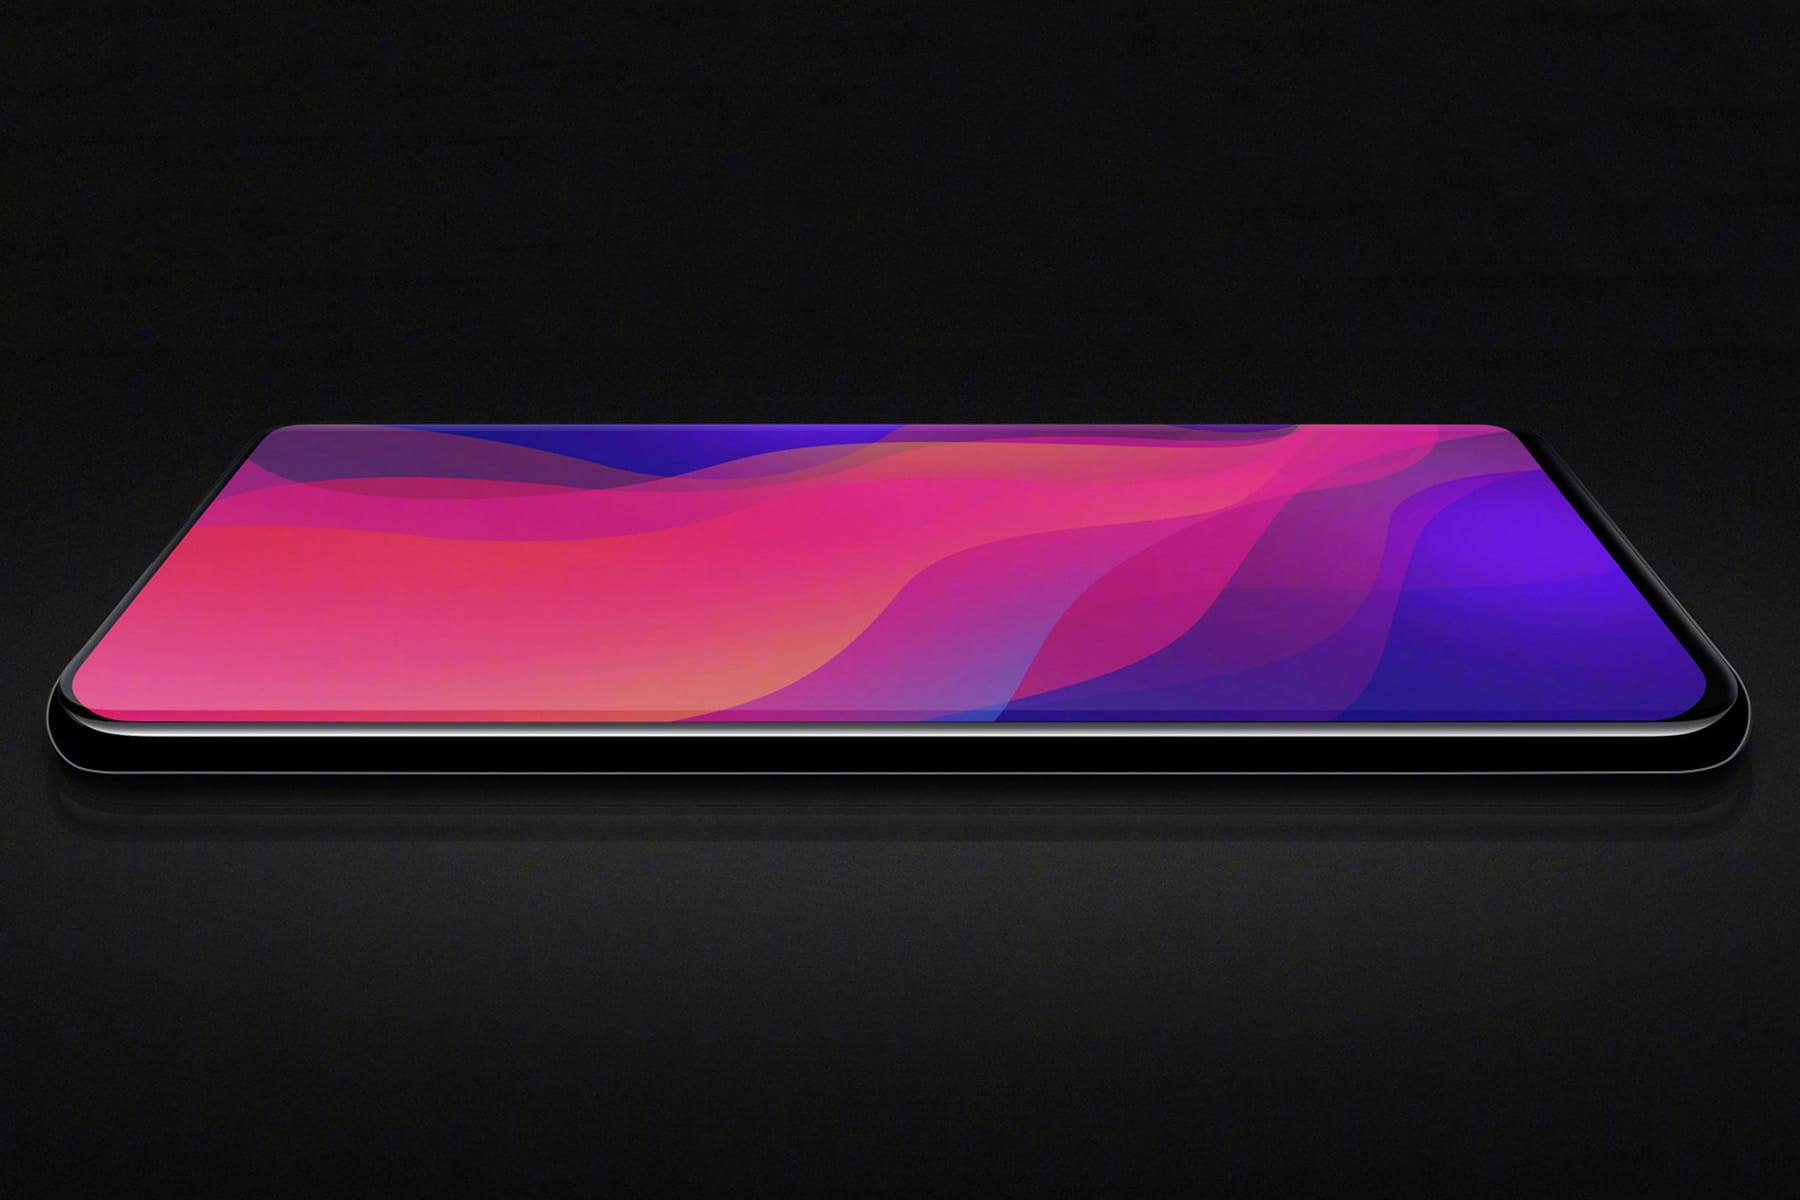 Новый рекорд: дисплей Oppo Find Xзанимает 93,8% площади лицевой панели